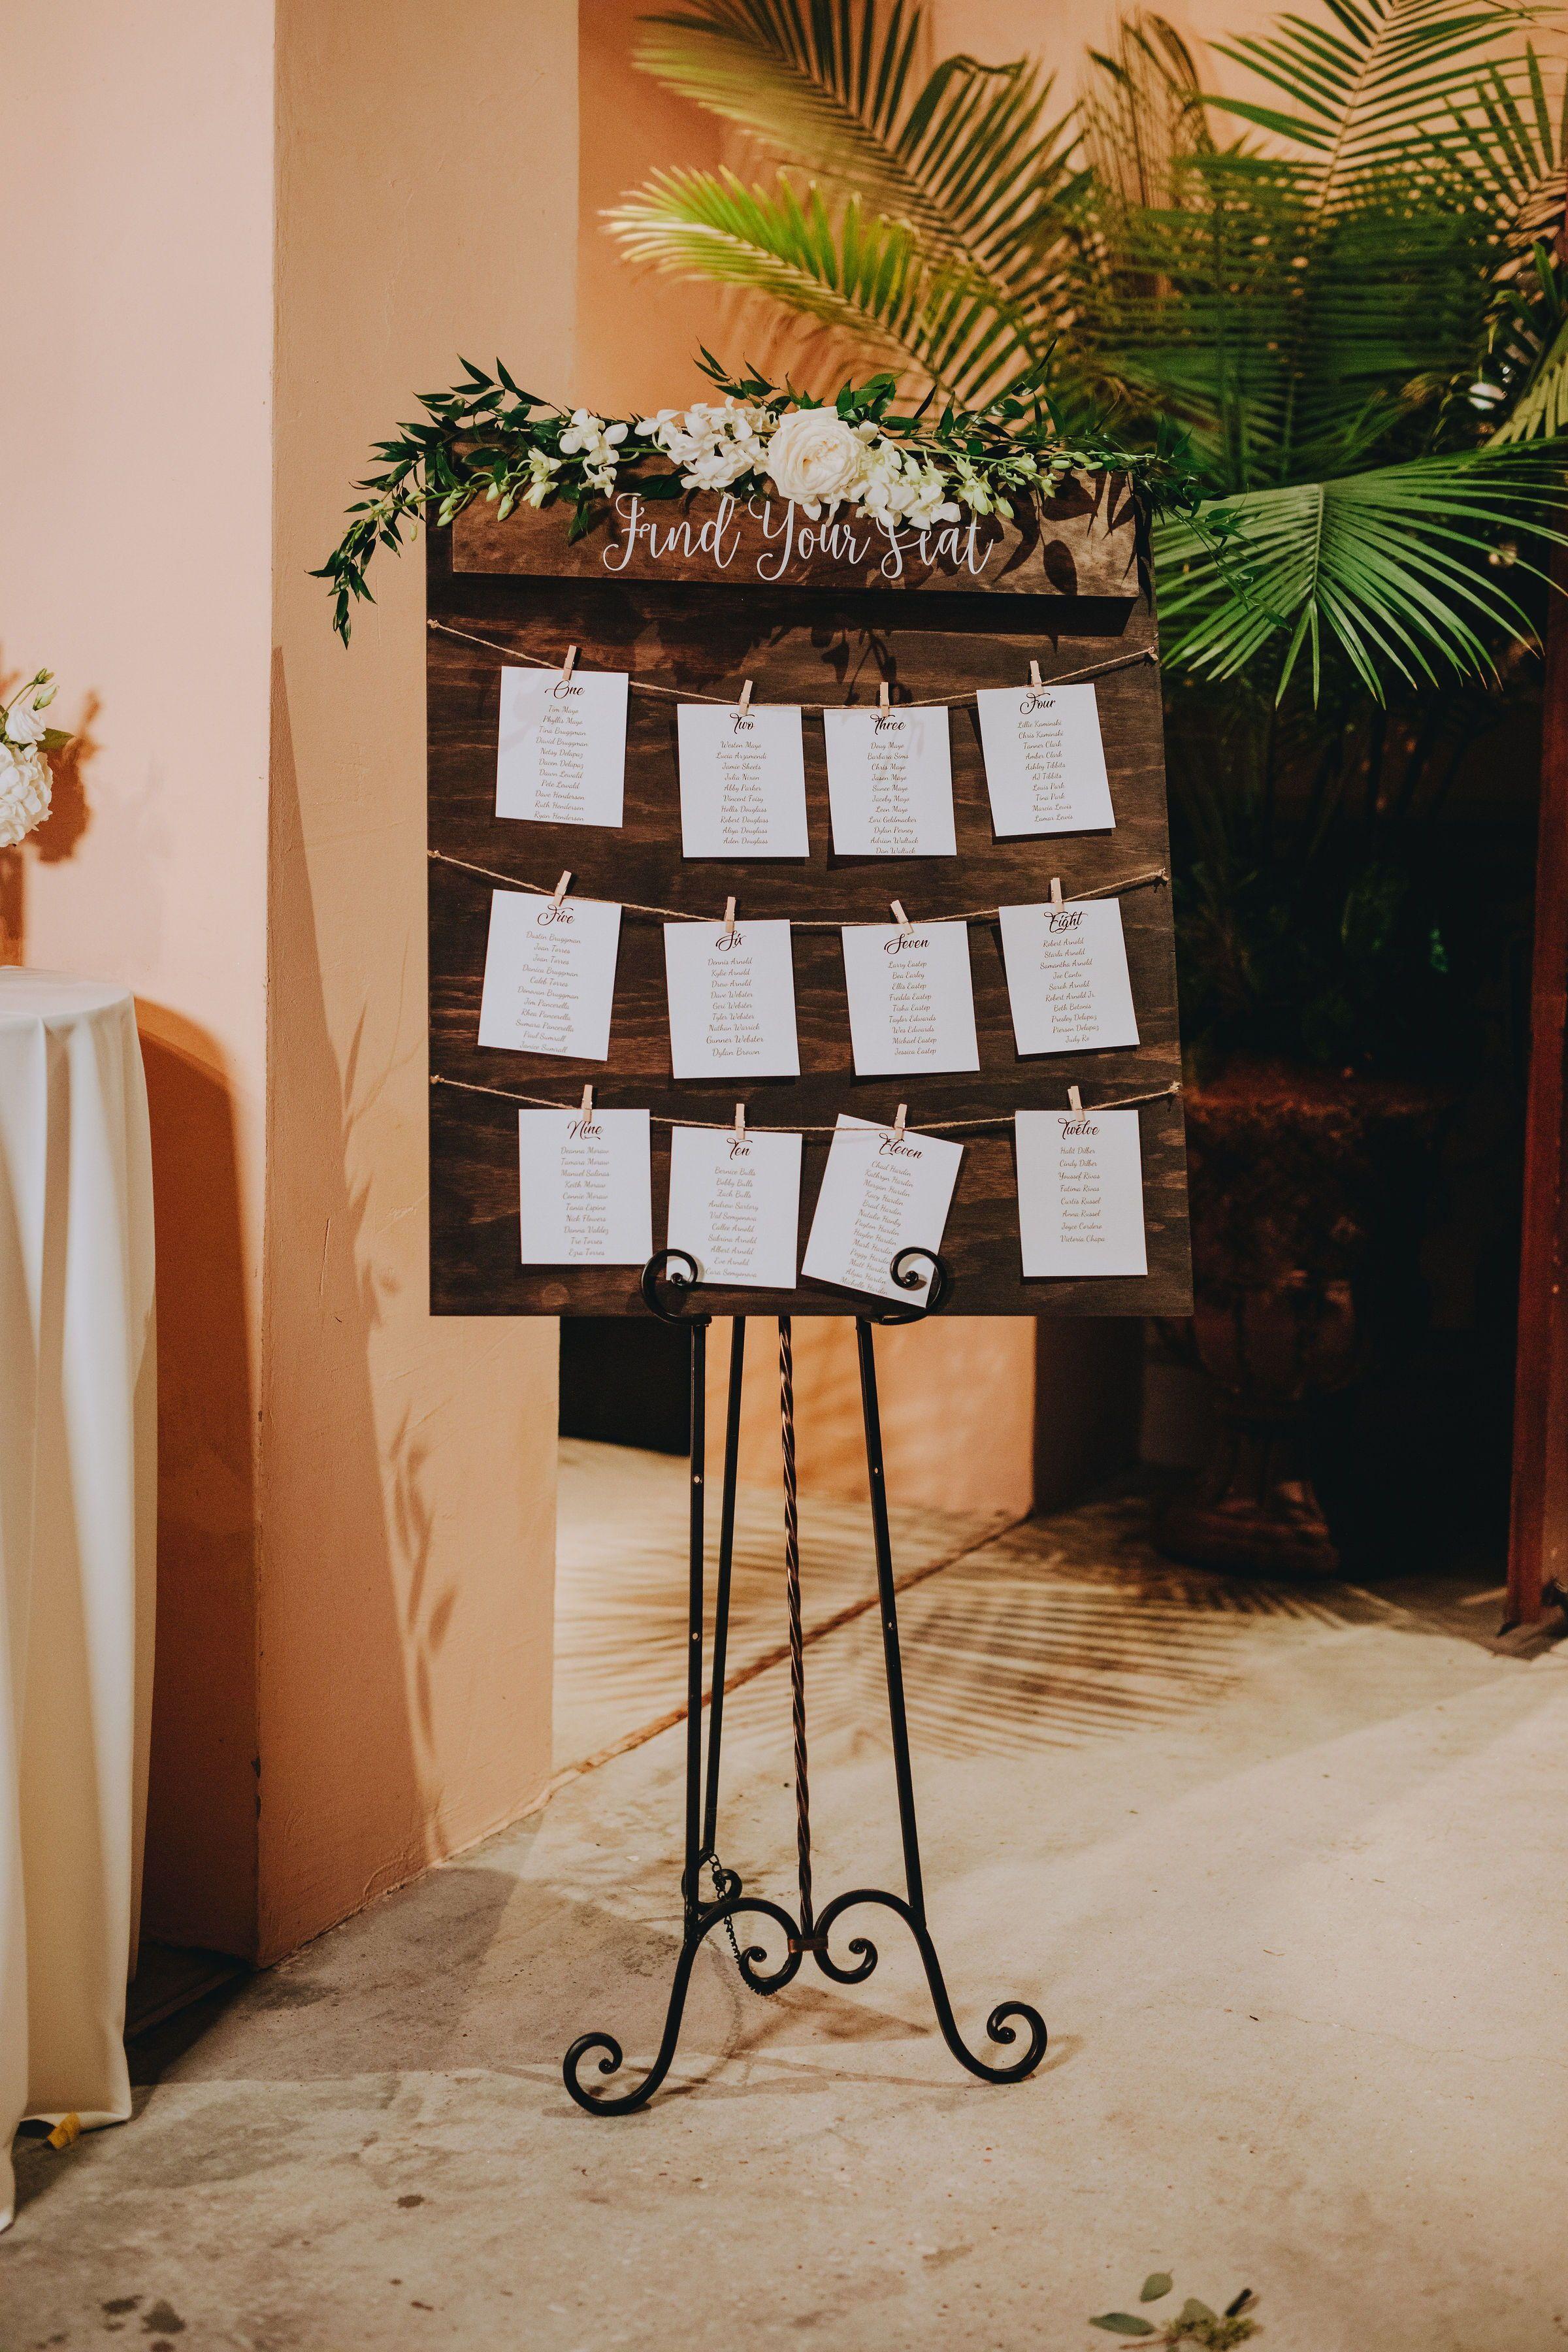 Wedding Day Goals in 2020 | Wedding venue houston, Wedding ...